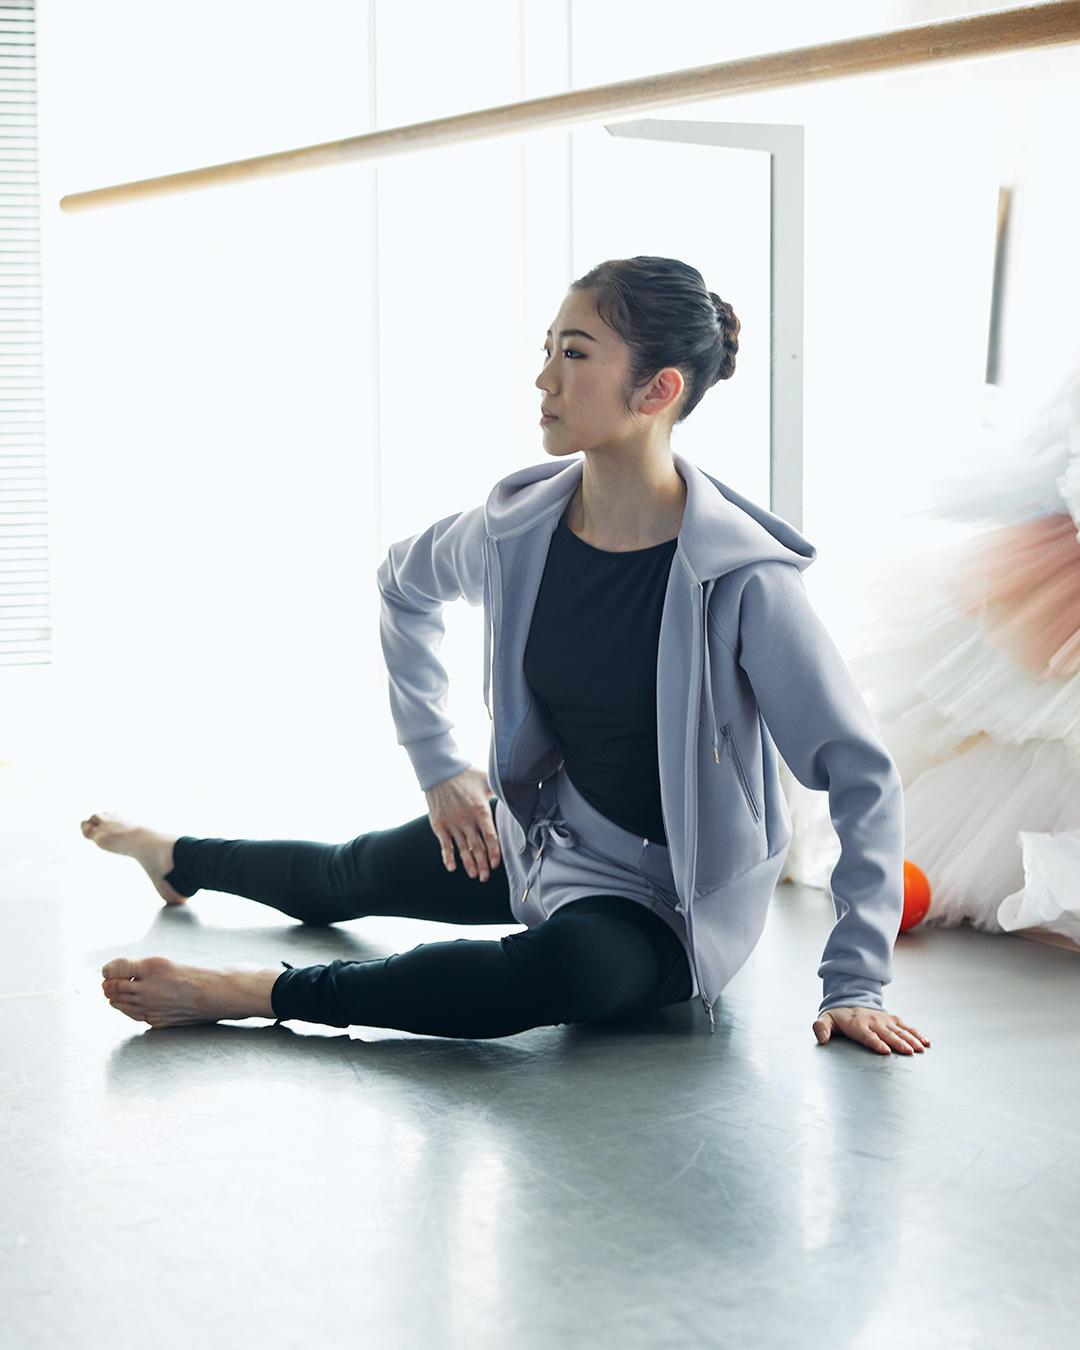 210331_ballet_warmup_12.jpg